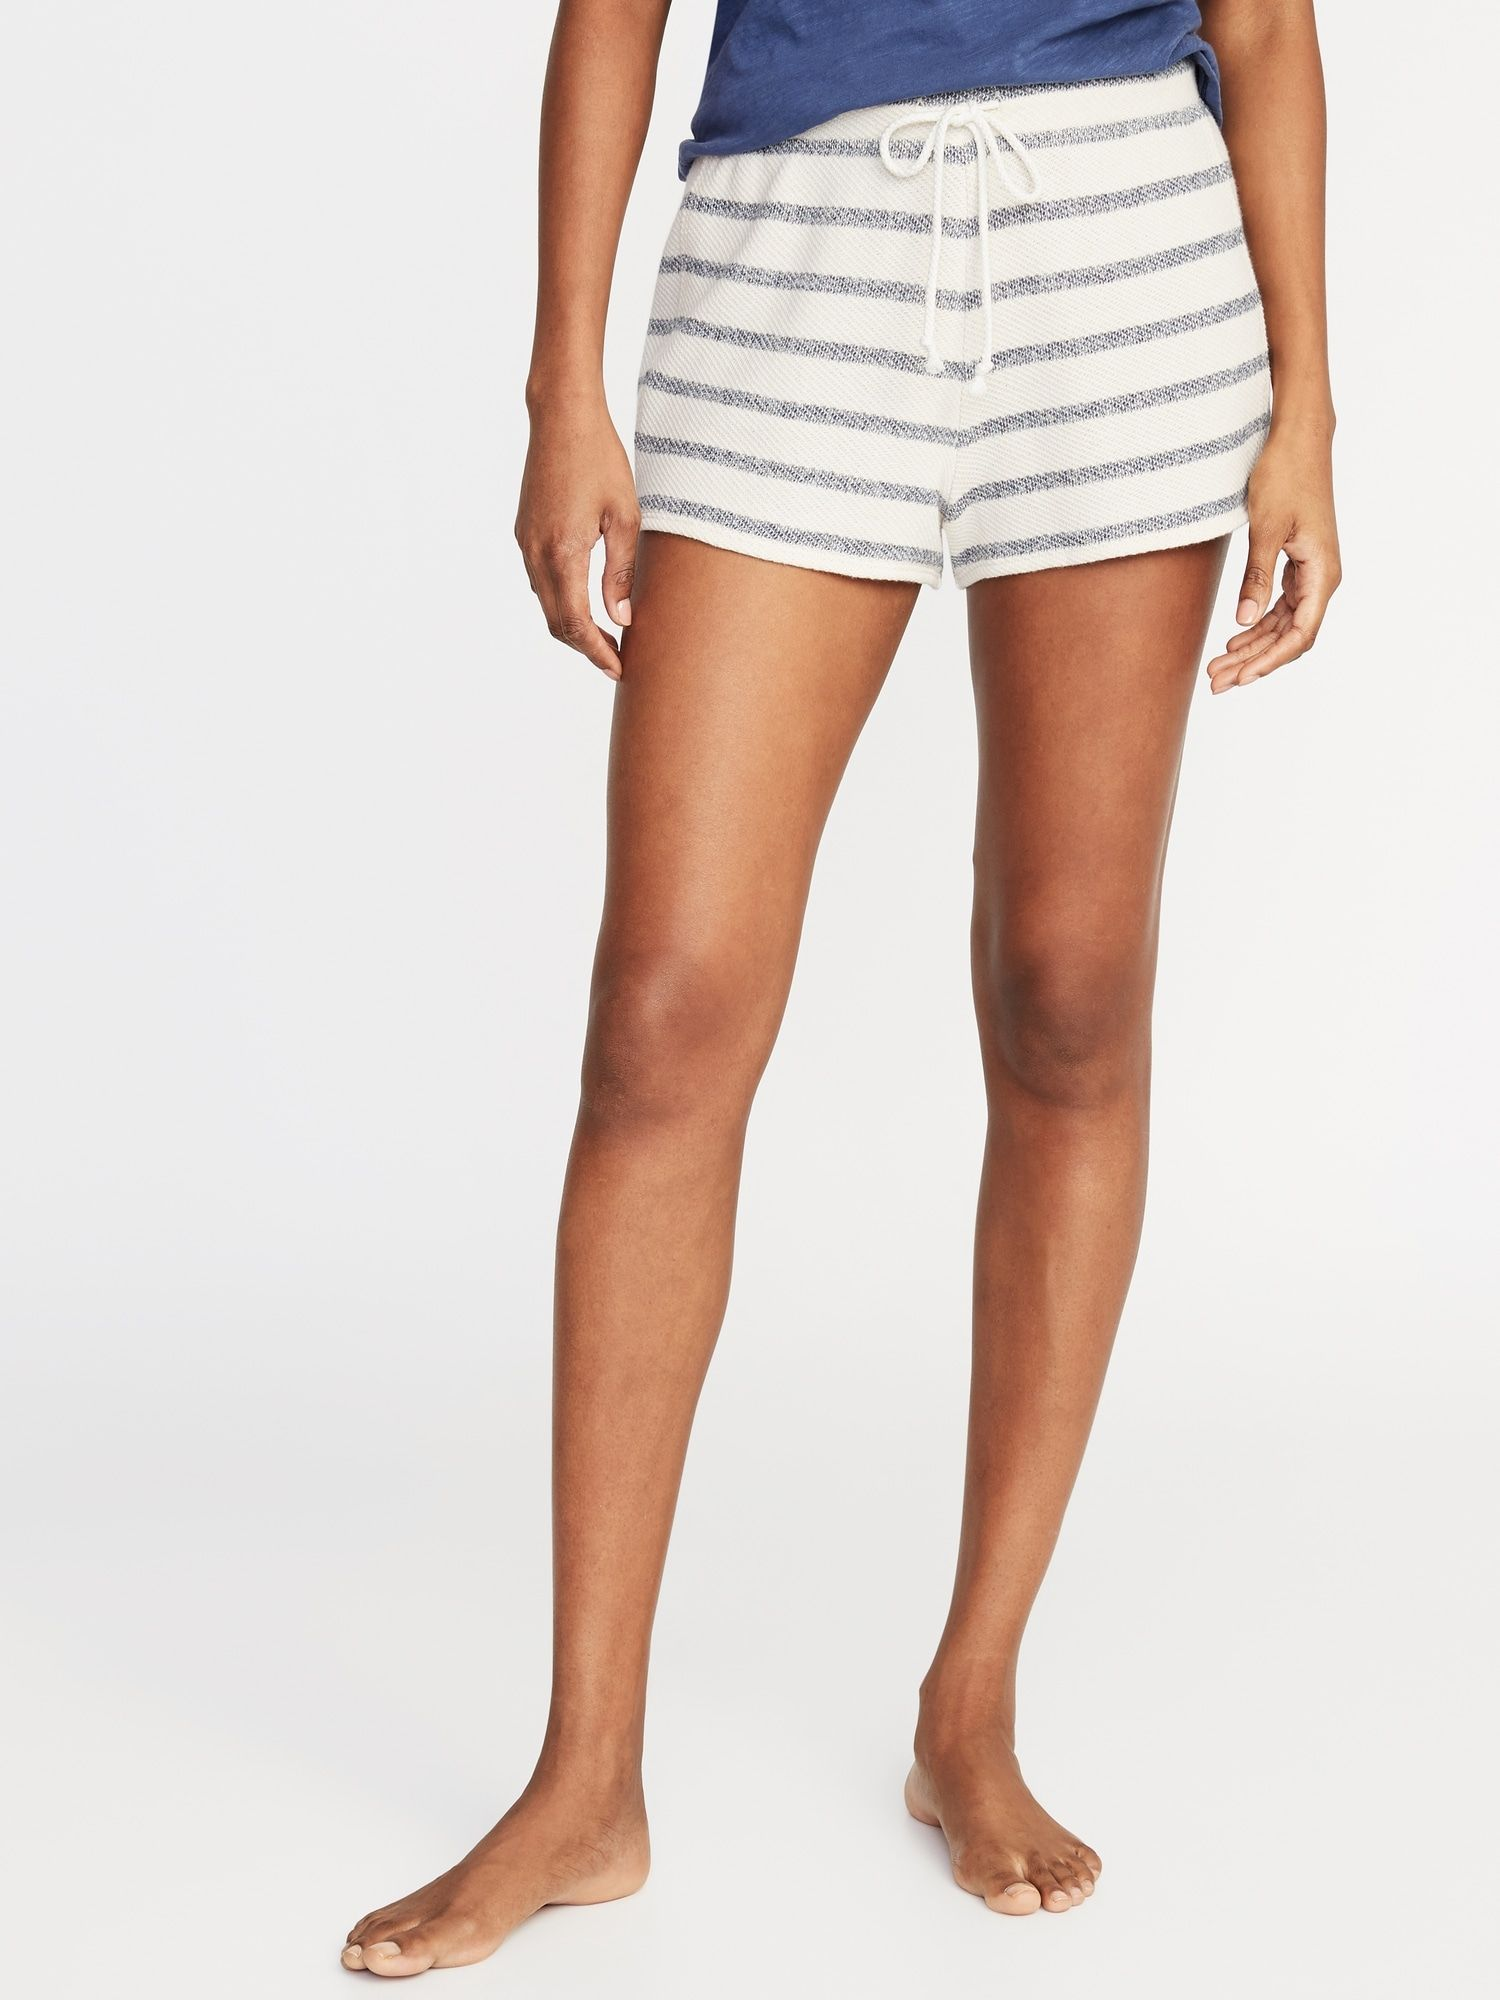 Striped CaliFleece Shorts for Women Old Navy Pajamas